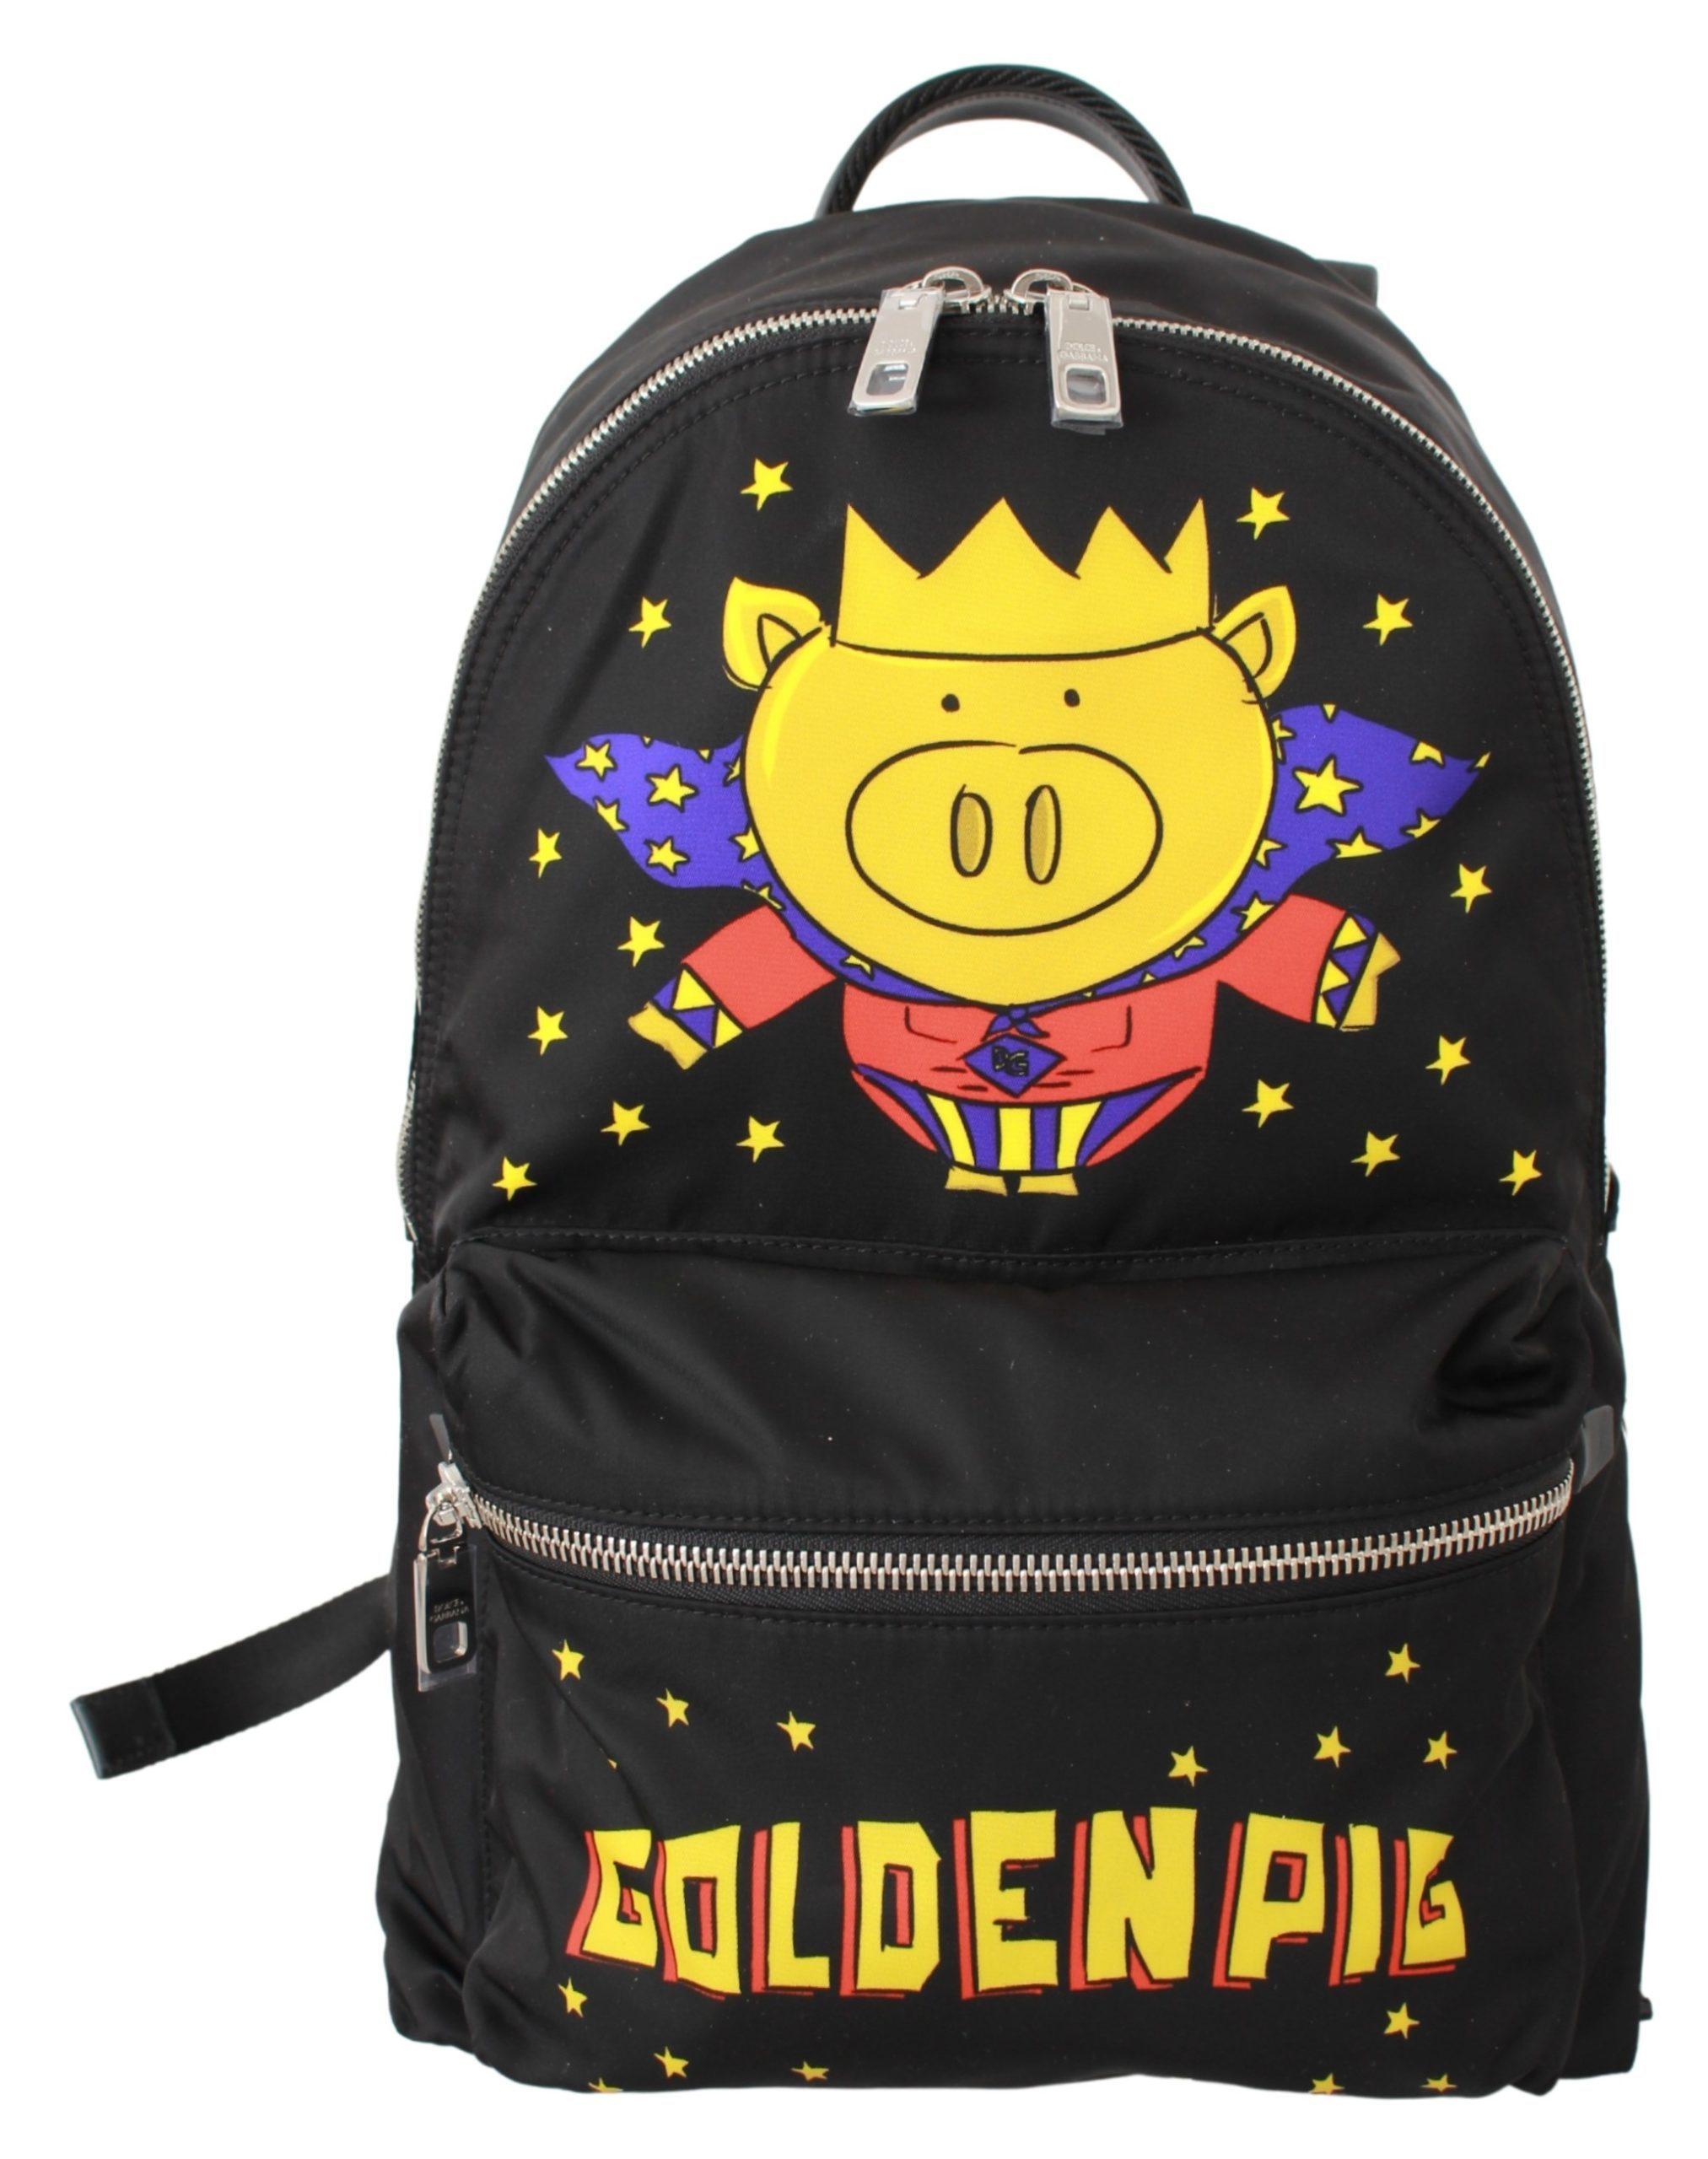 Dolce & Gabbana Men's Golden Pig of the Year School Backpack Black VAS9479